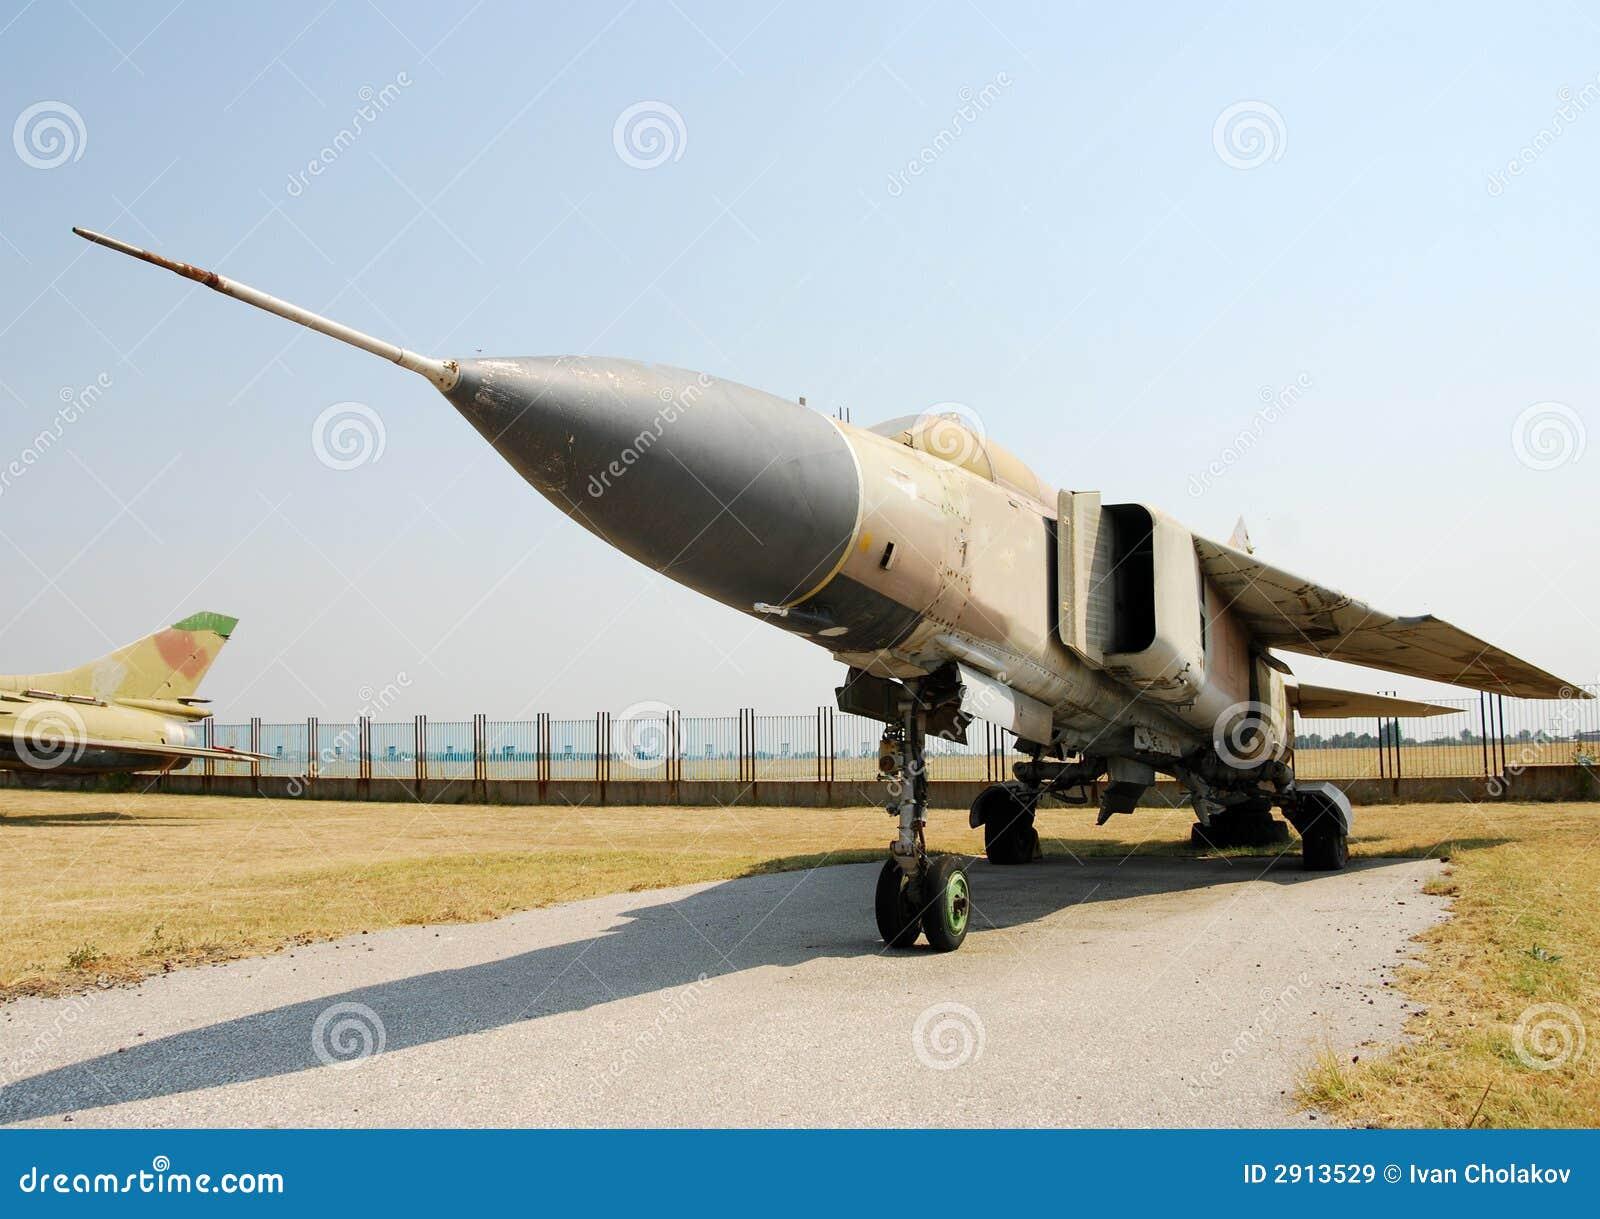 Cold war era jet fighter